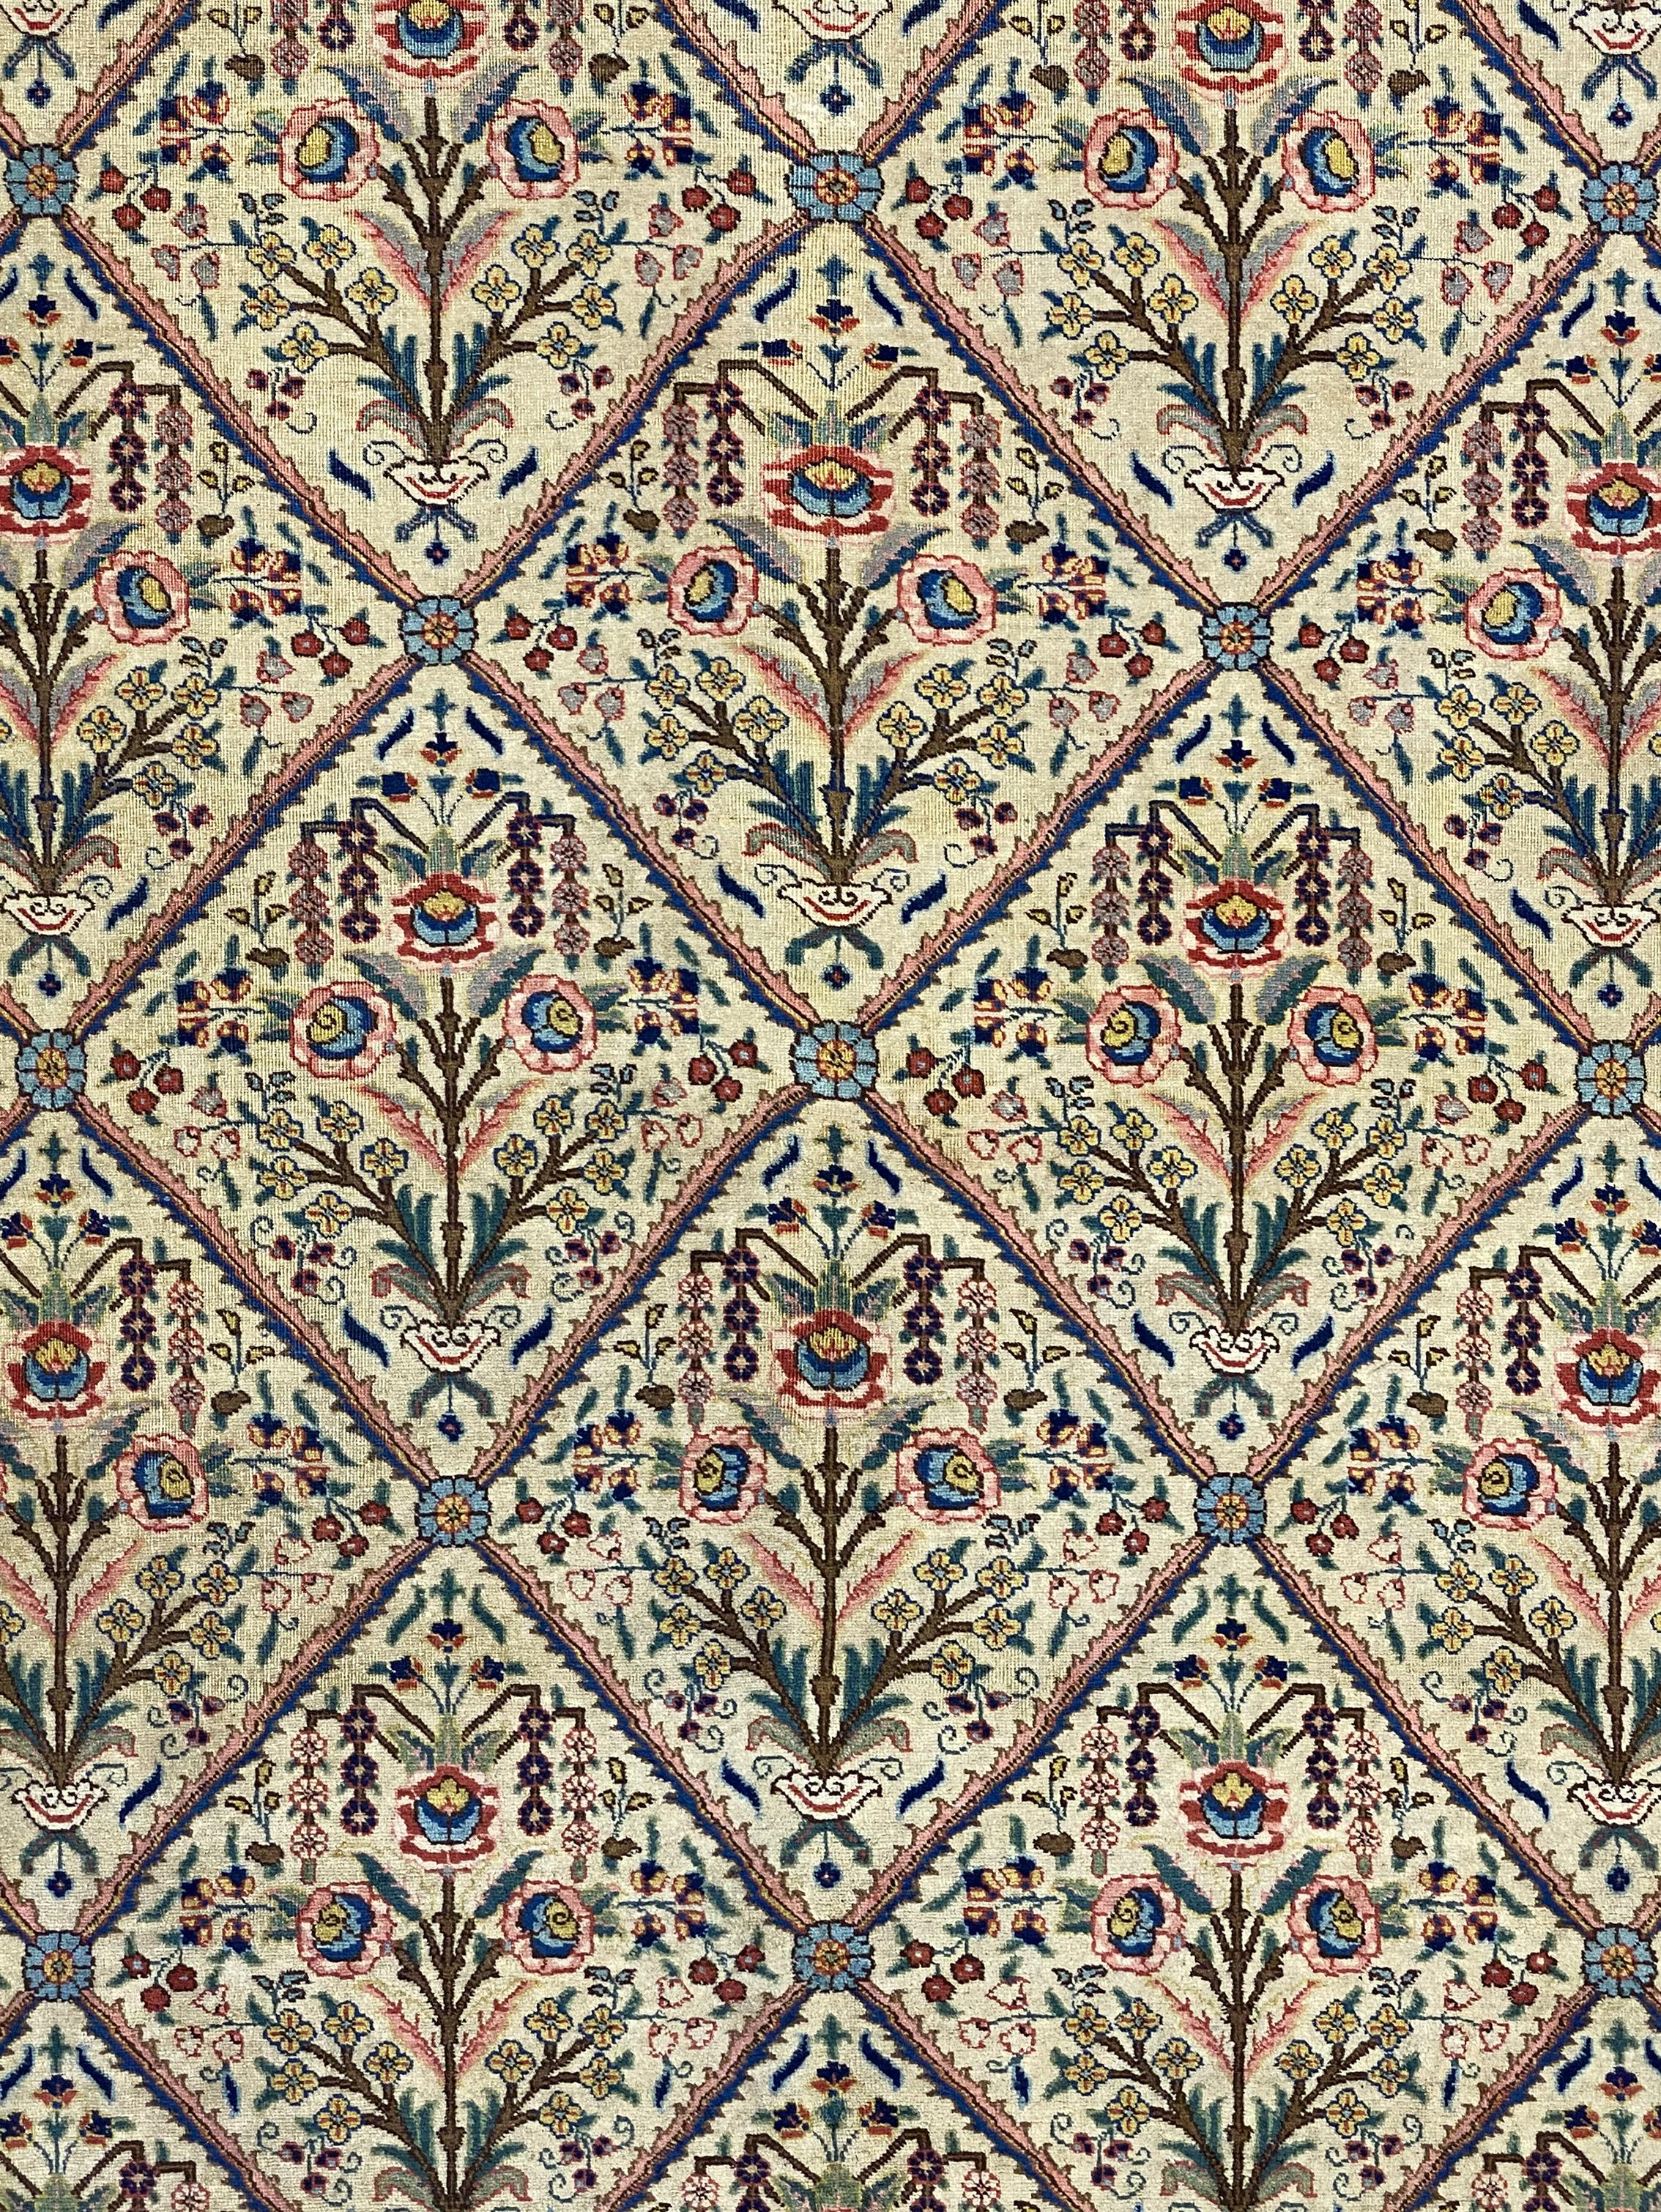 "Antique Persian Khoy 9' x 12' 4"" Handmade Area Rug - Shabahang Royal Carpet"